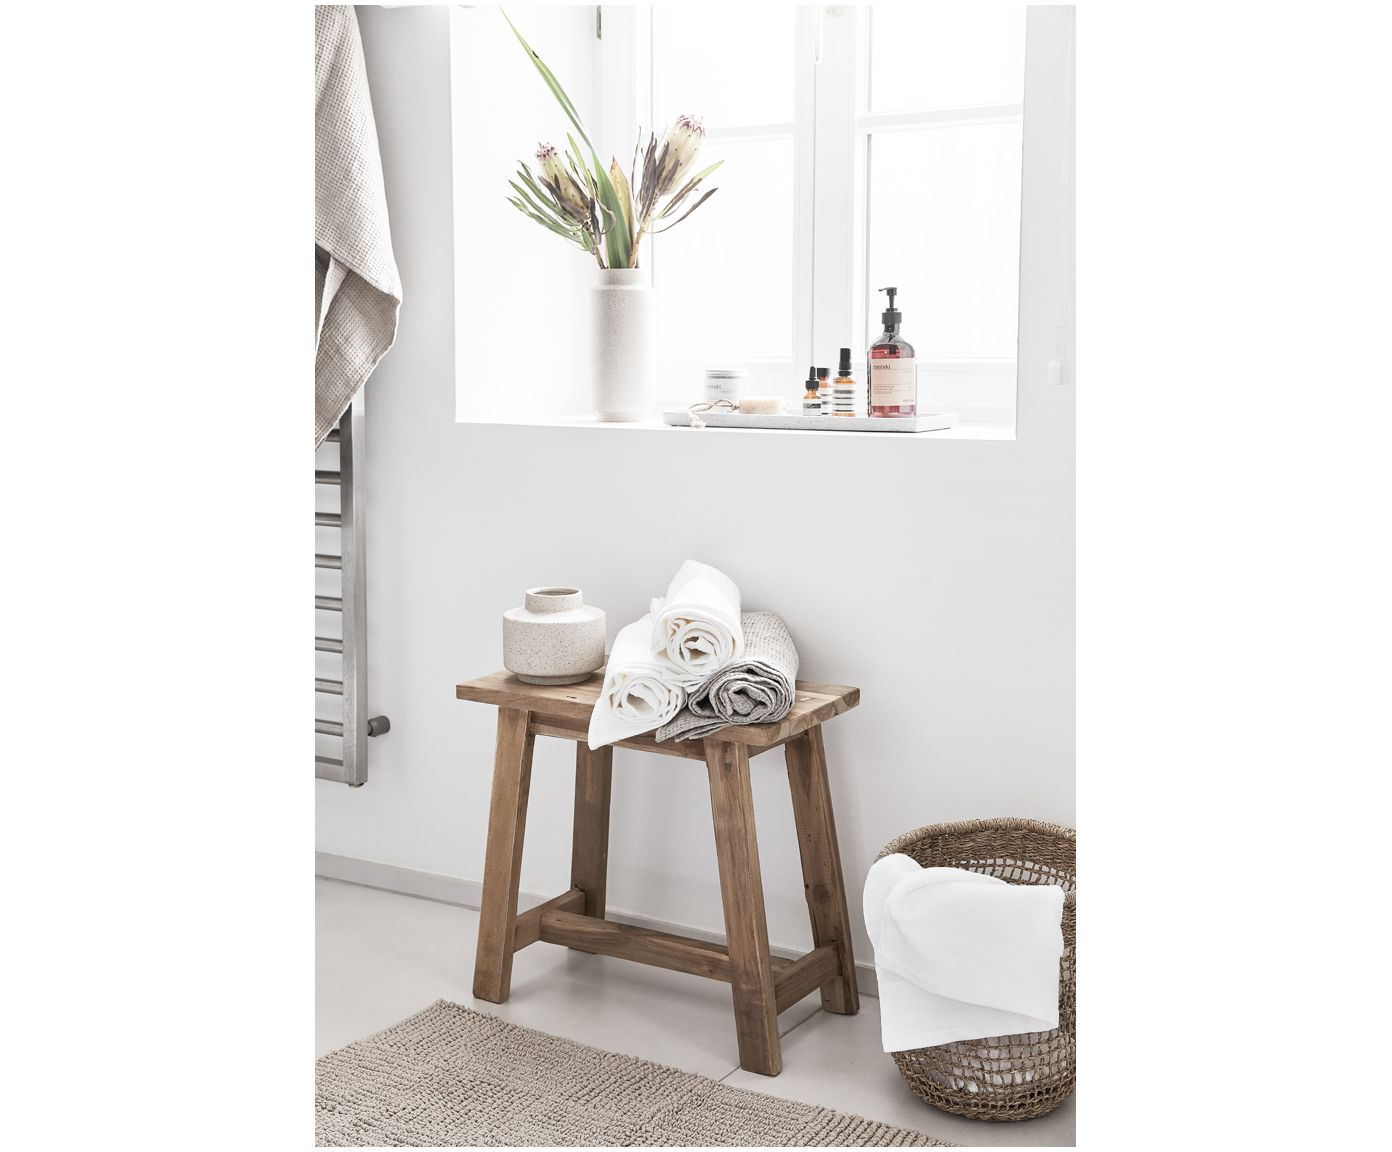 Hocker Lawas In 2019 Bad Furniture Bathroom Und Decor